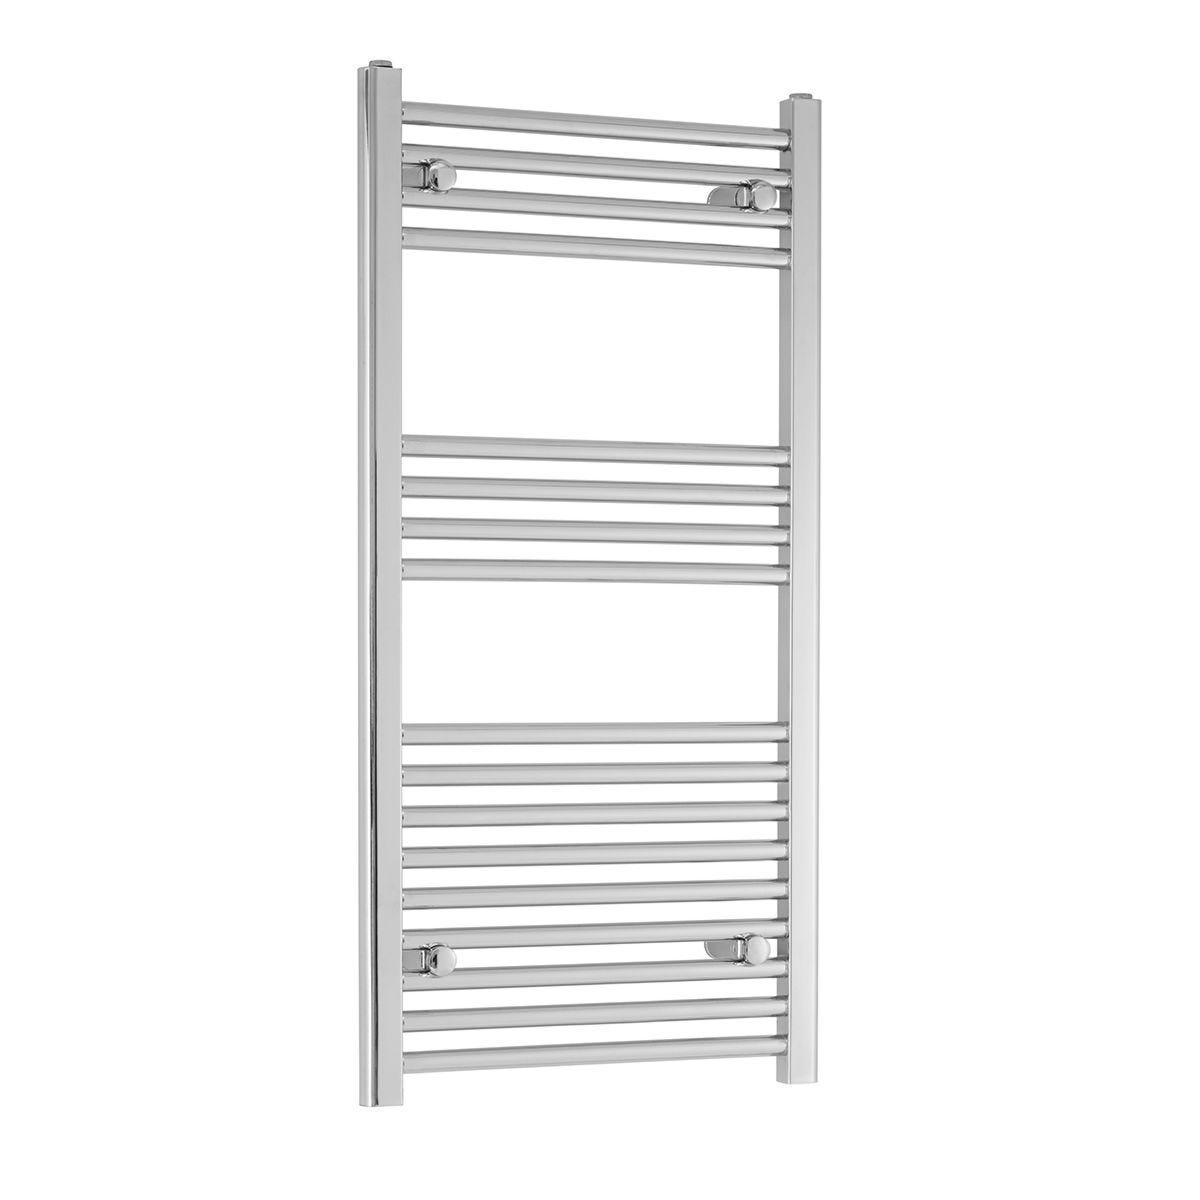 Heating Style Blythe Ladder Rail 1800x600mm Straight - Chrome